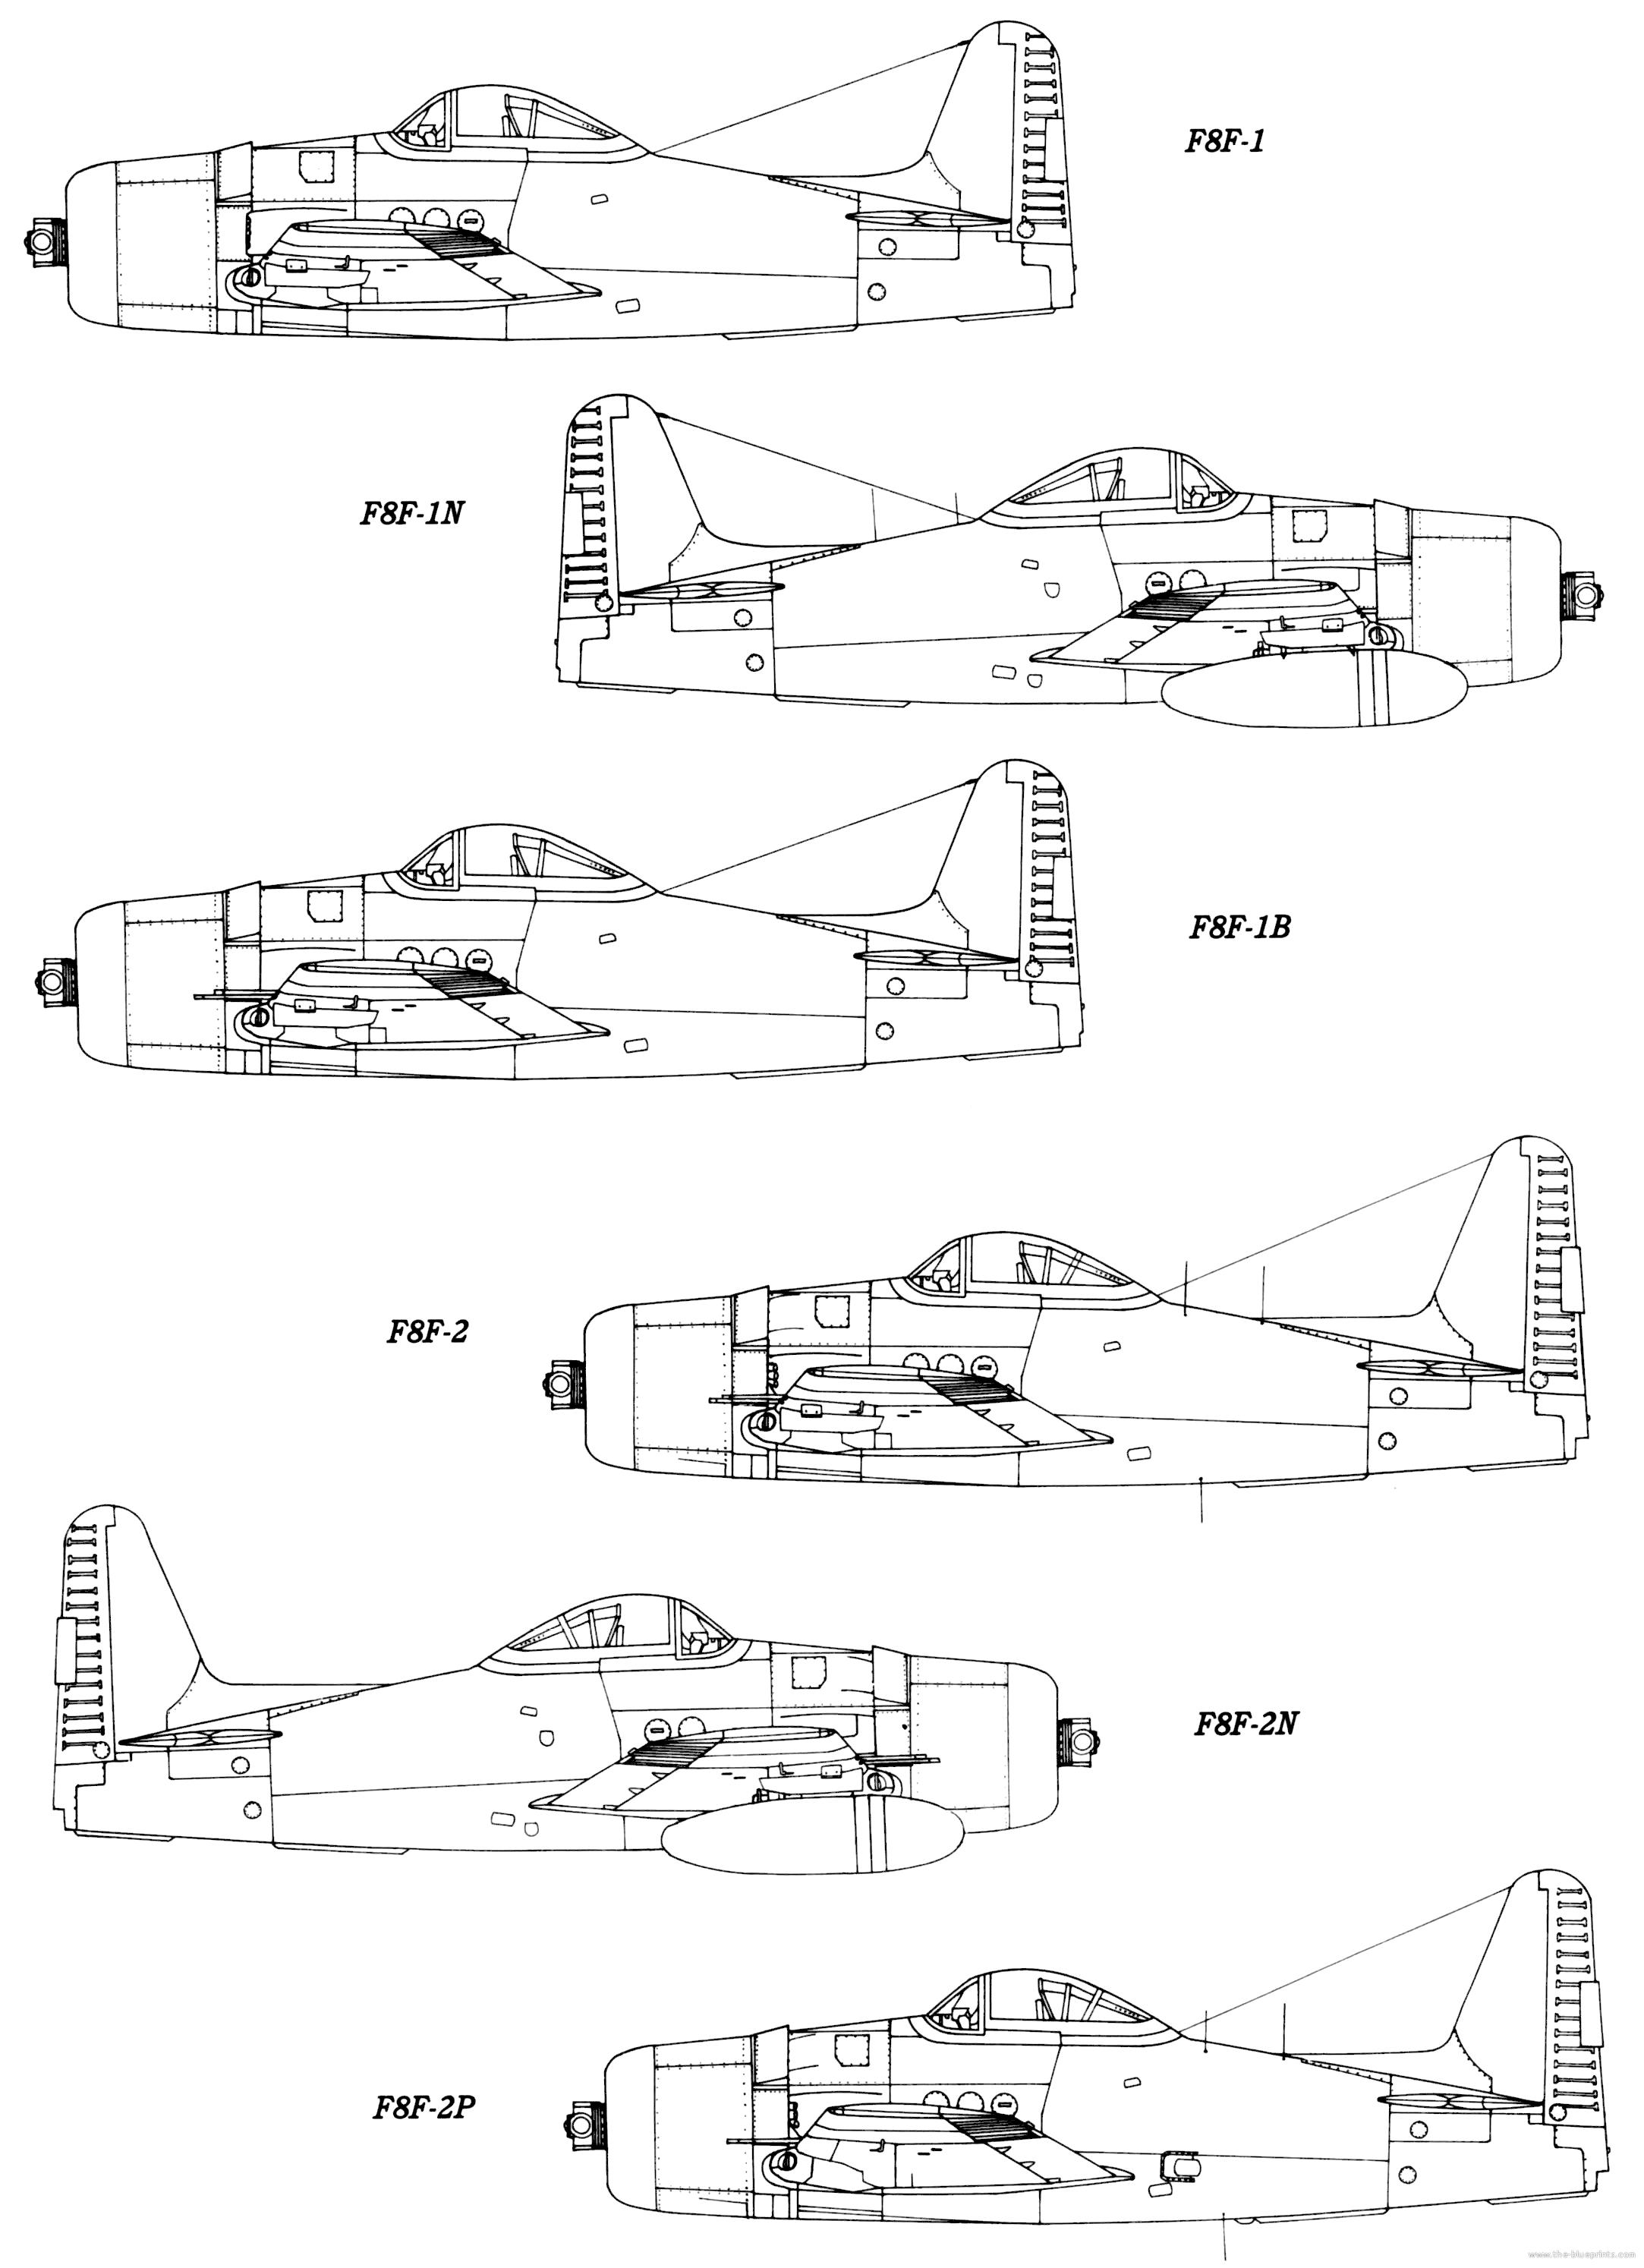 Submit Vat Online >> Blueprints > WW2 Airplanes > Grumman > Grumman F8F Bearcat